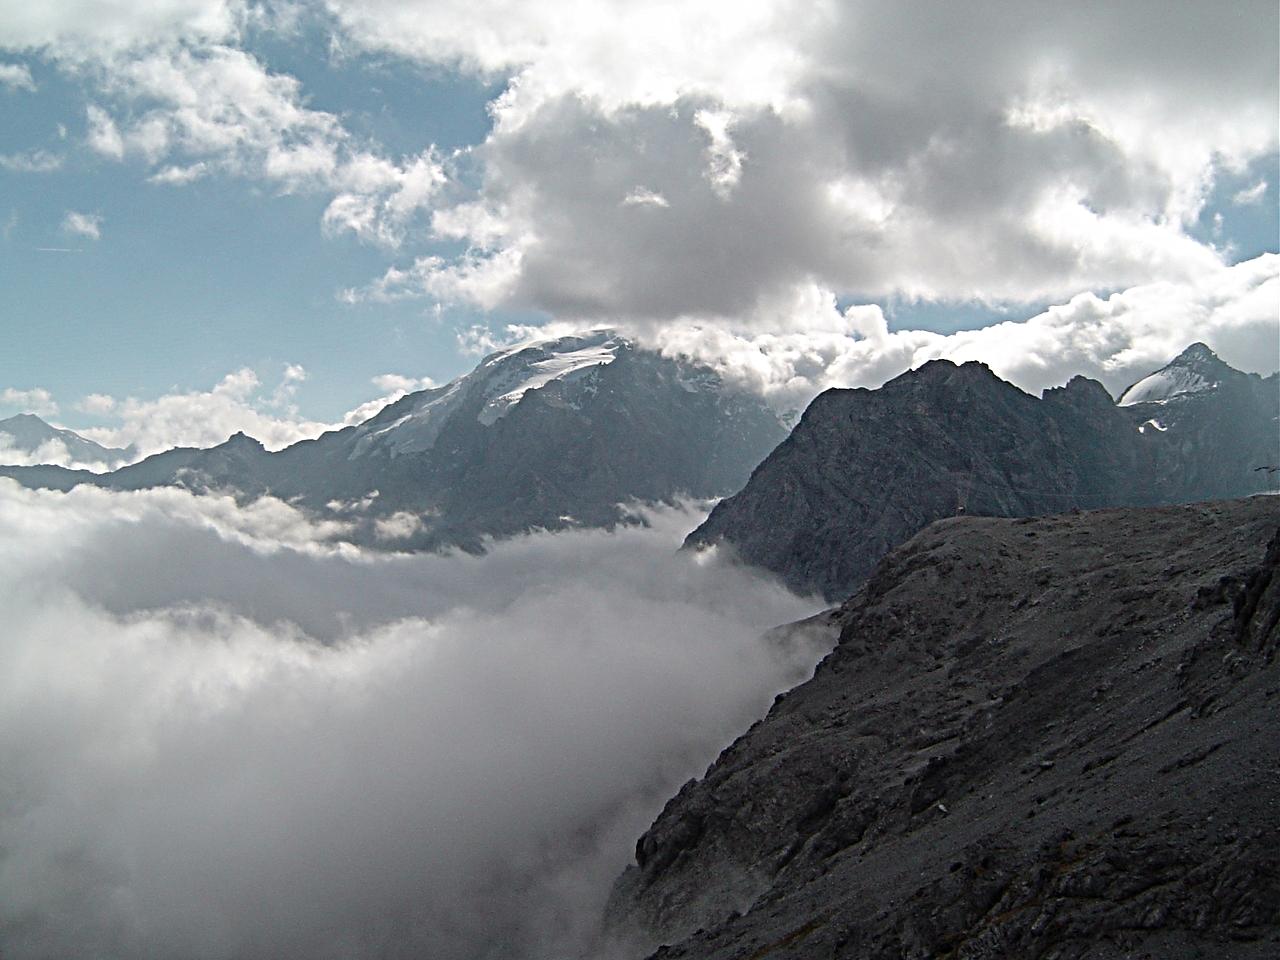 Vitesse datant de Bolzano